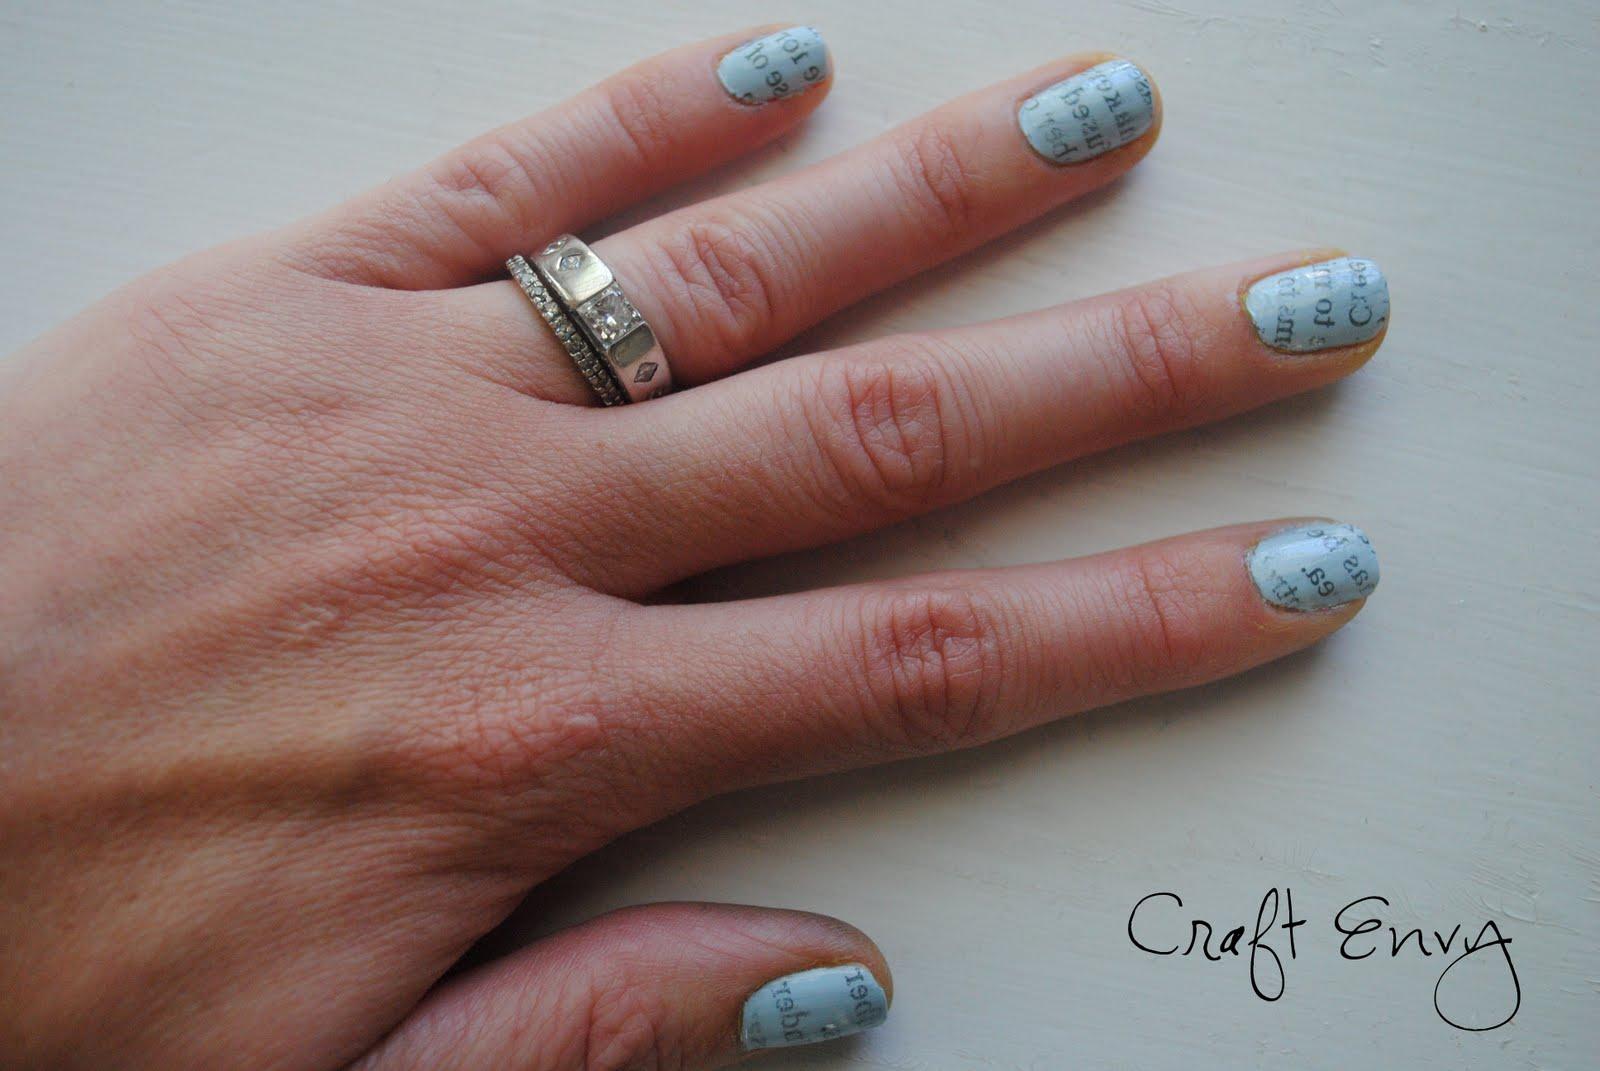 Craft Envy: Newspaper Nails